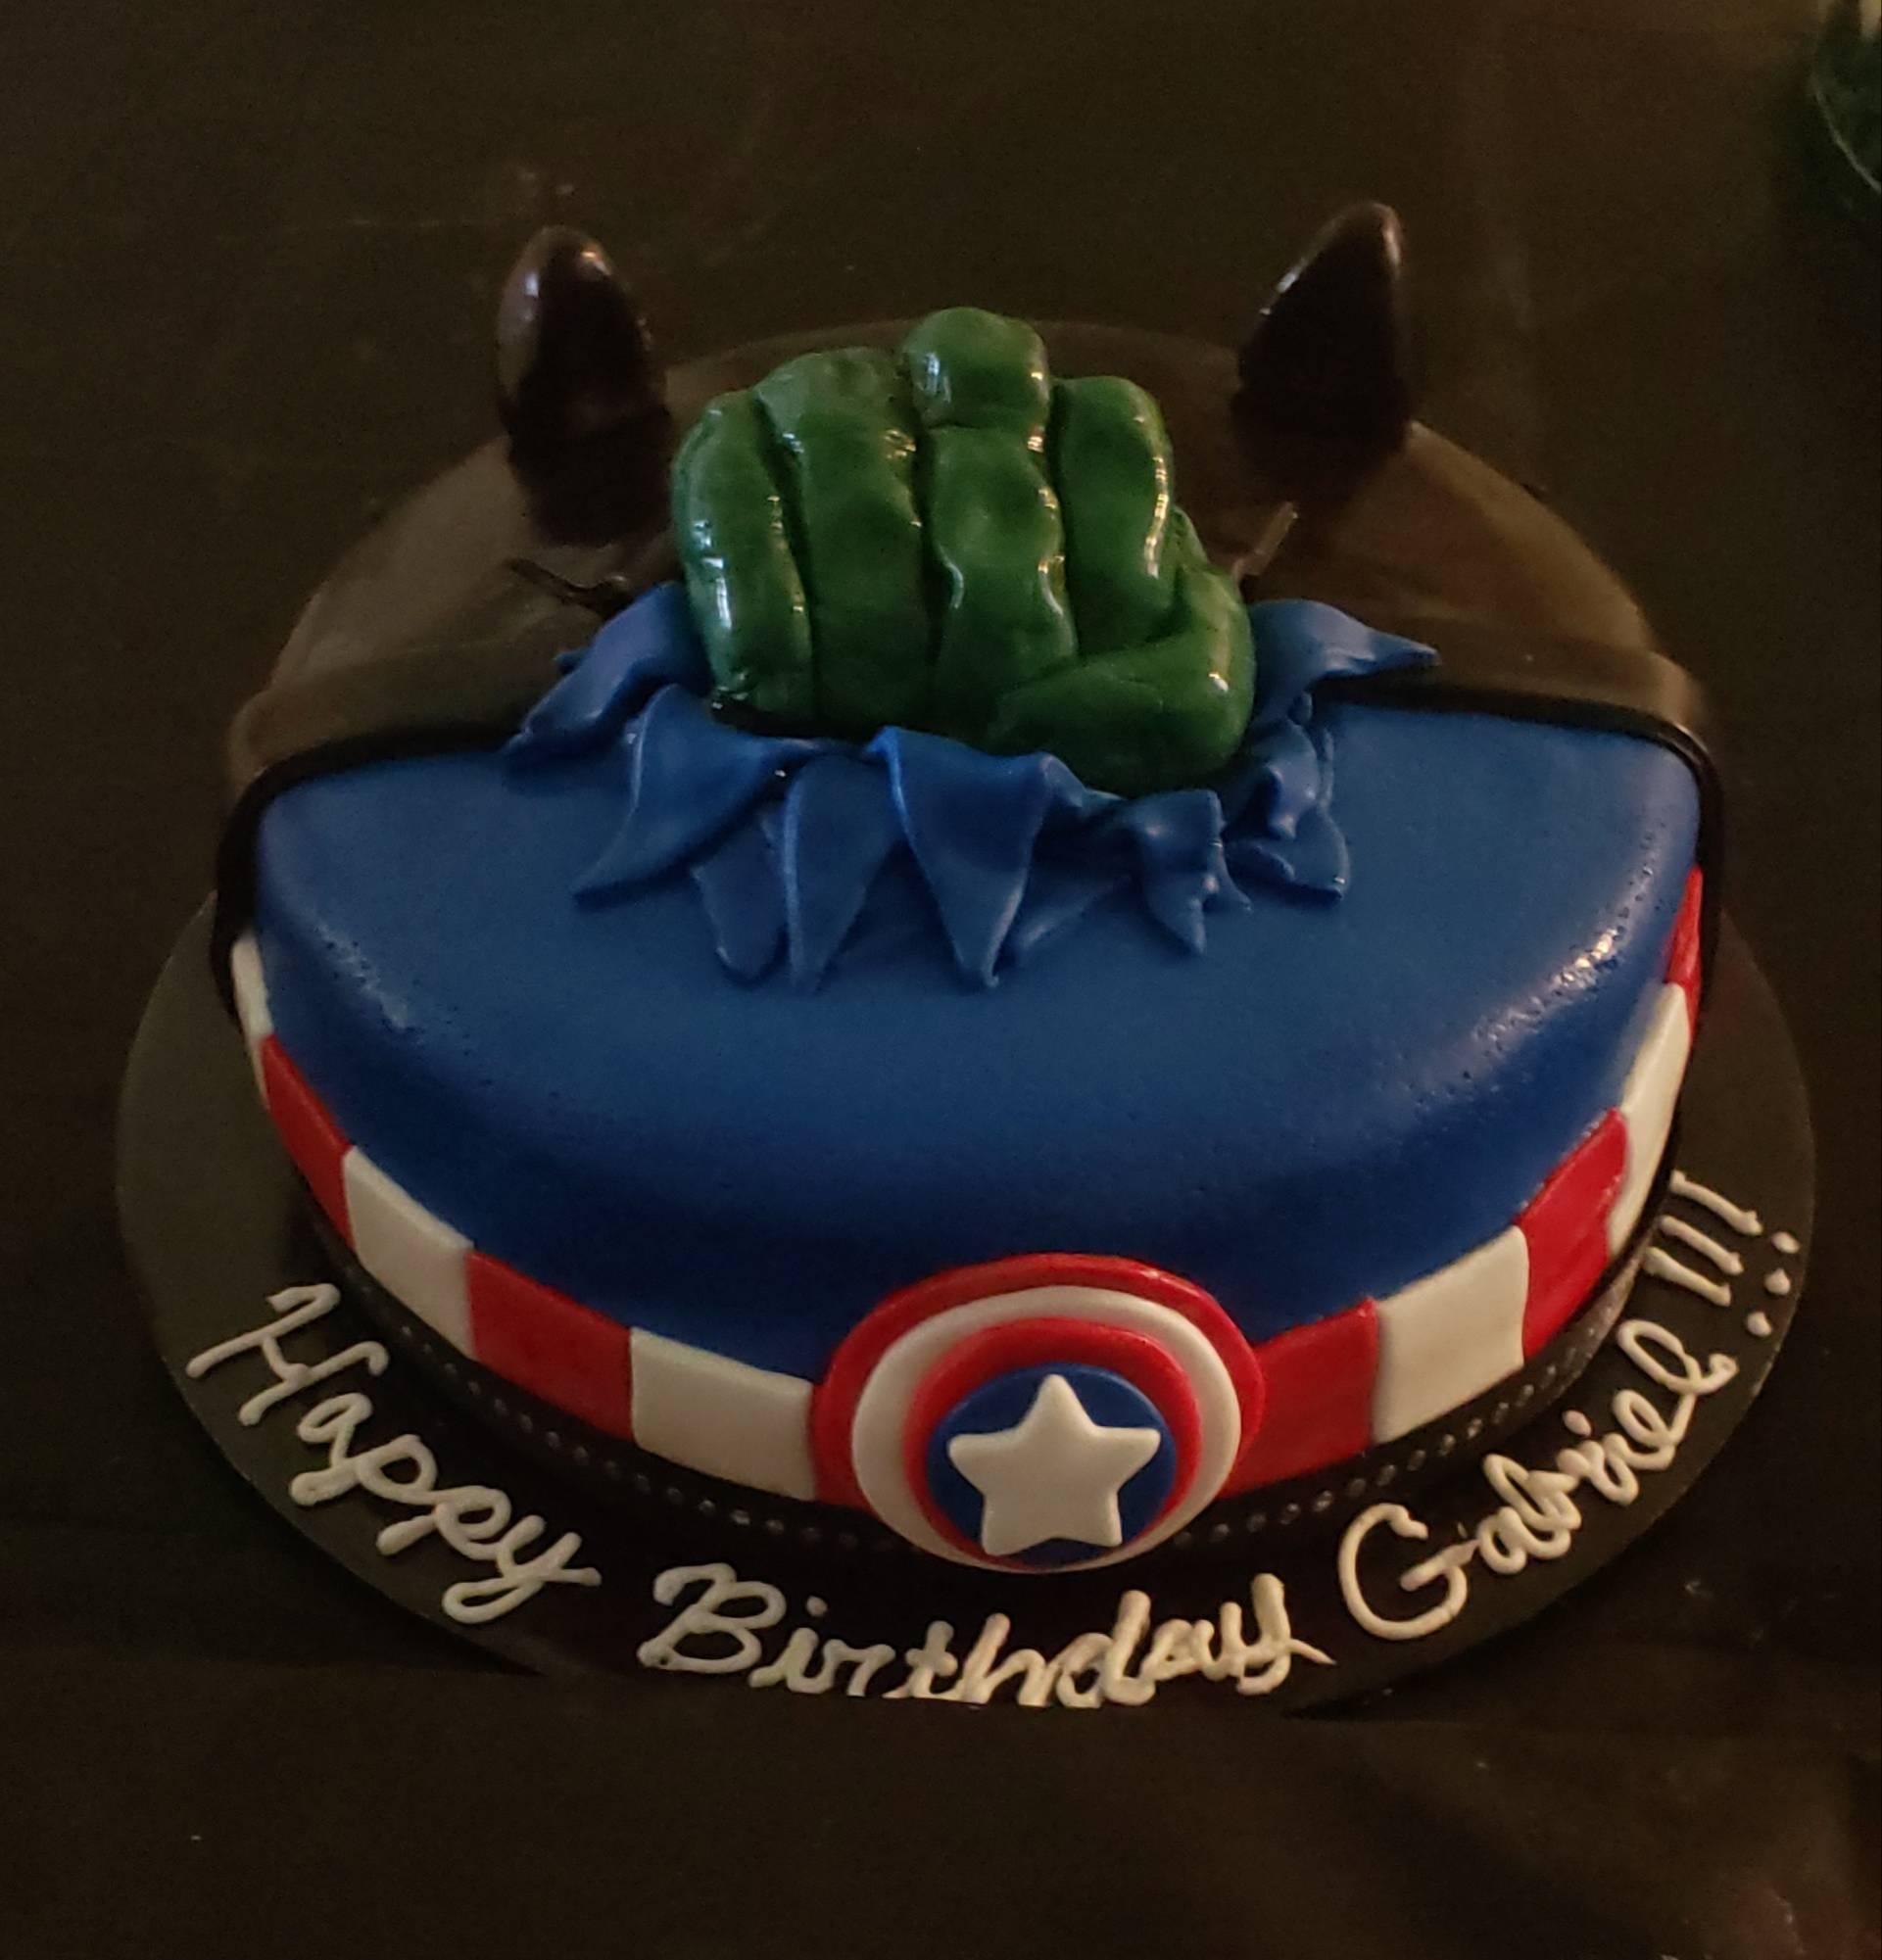 Captain America, Hulk and Black Panther